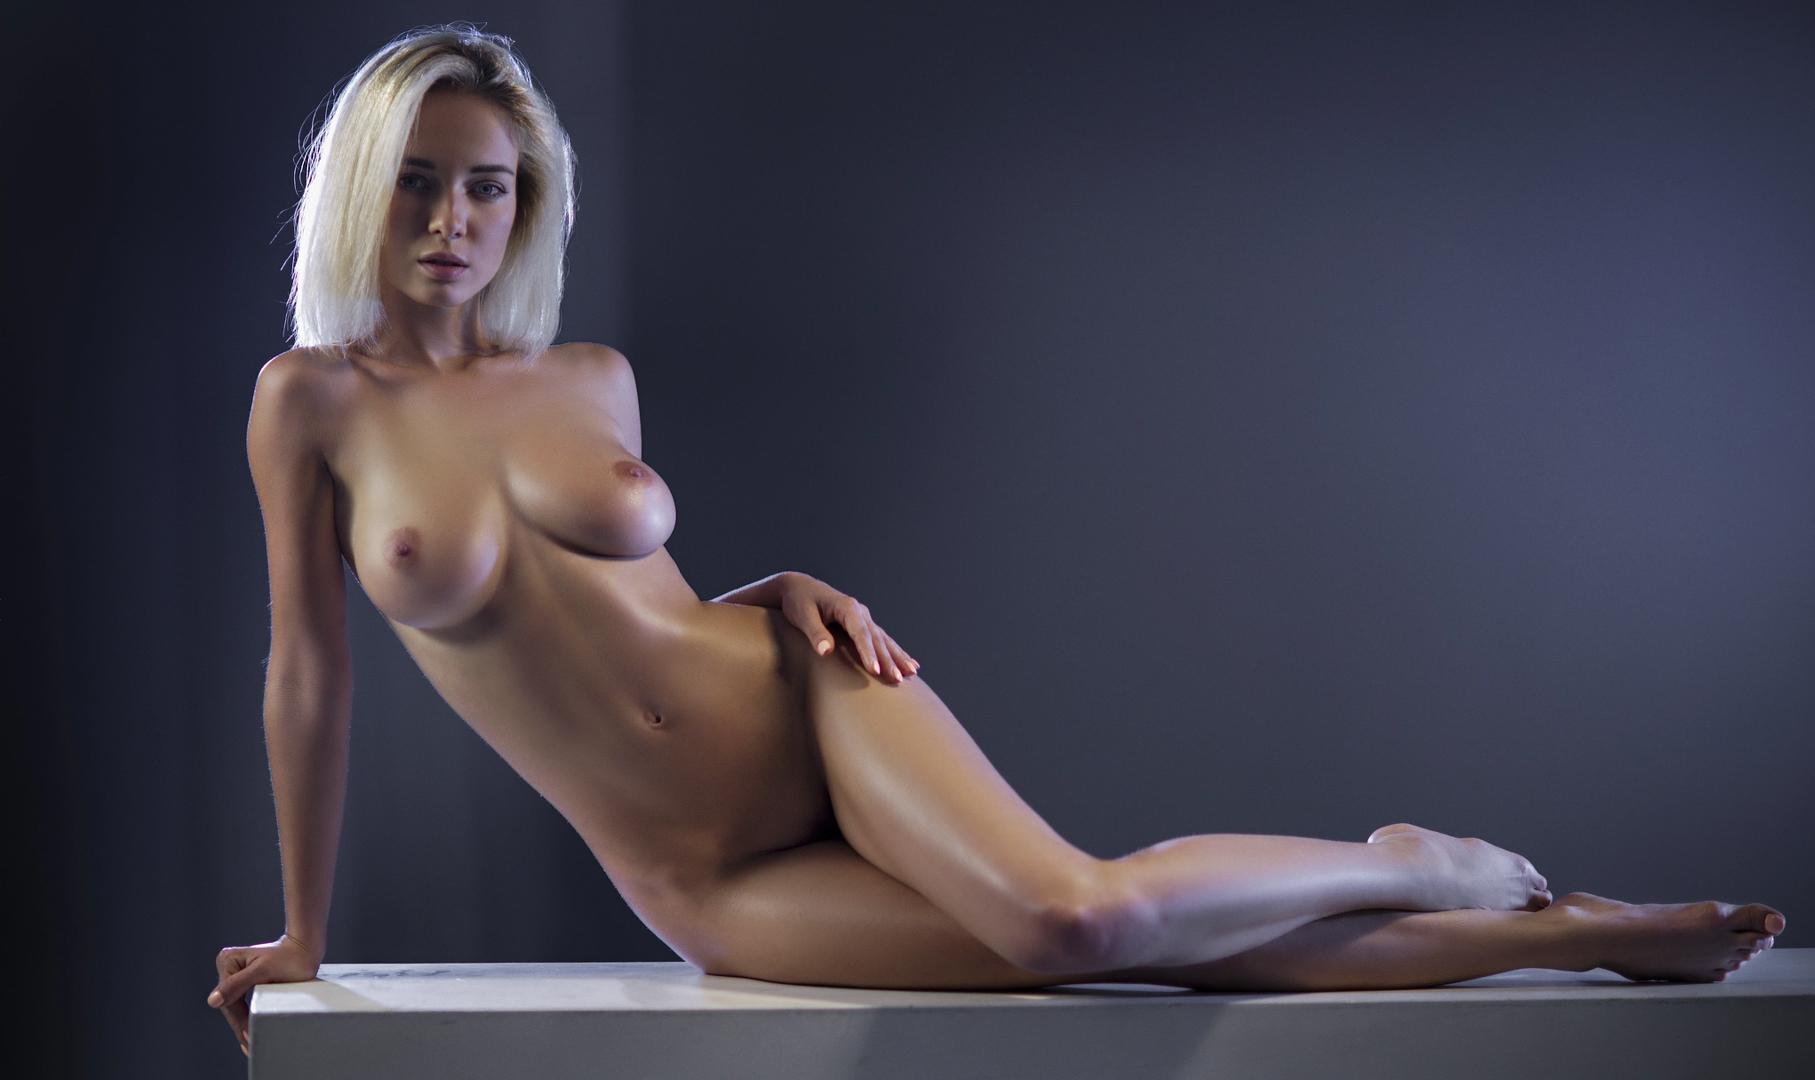 Andreewa porn natalja Russian Sexwife